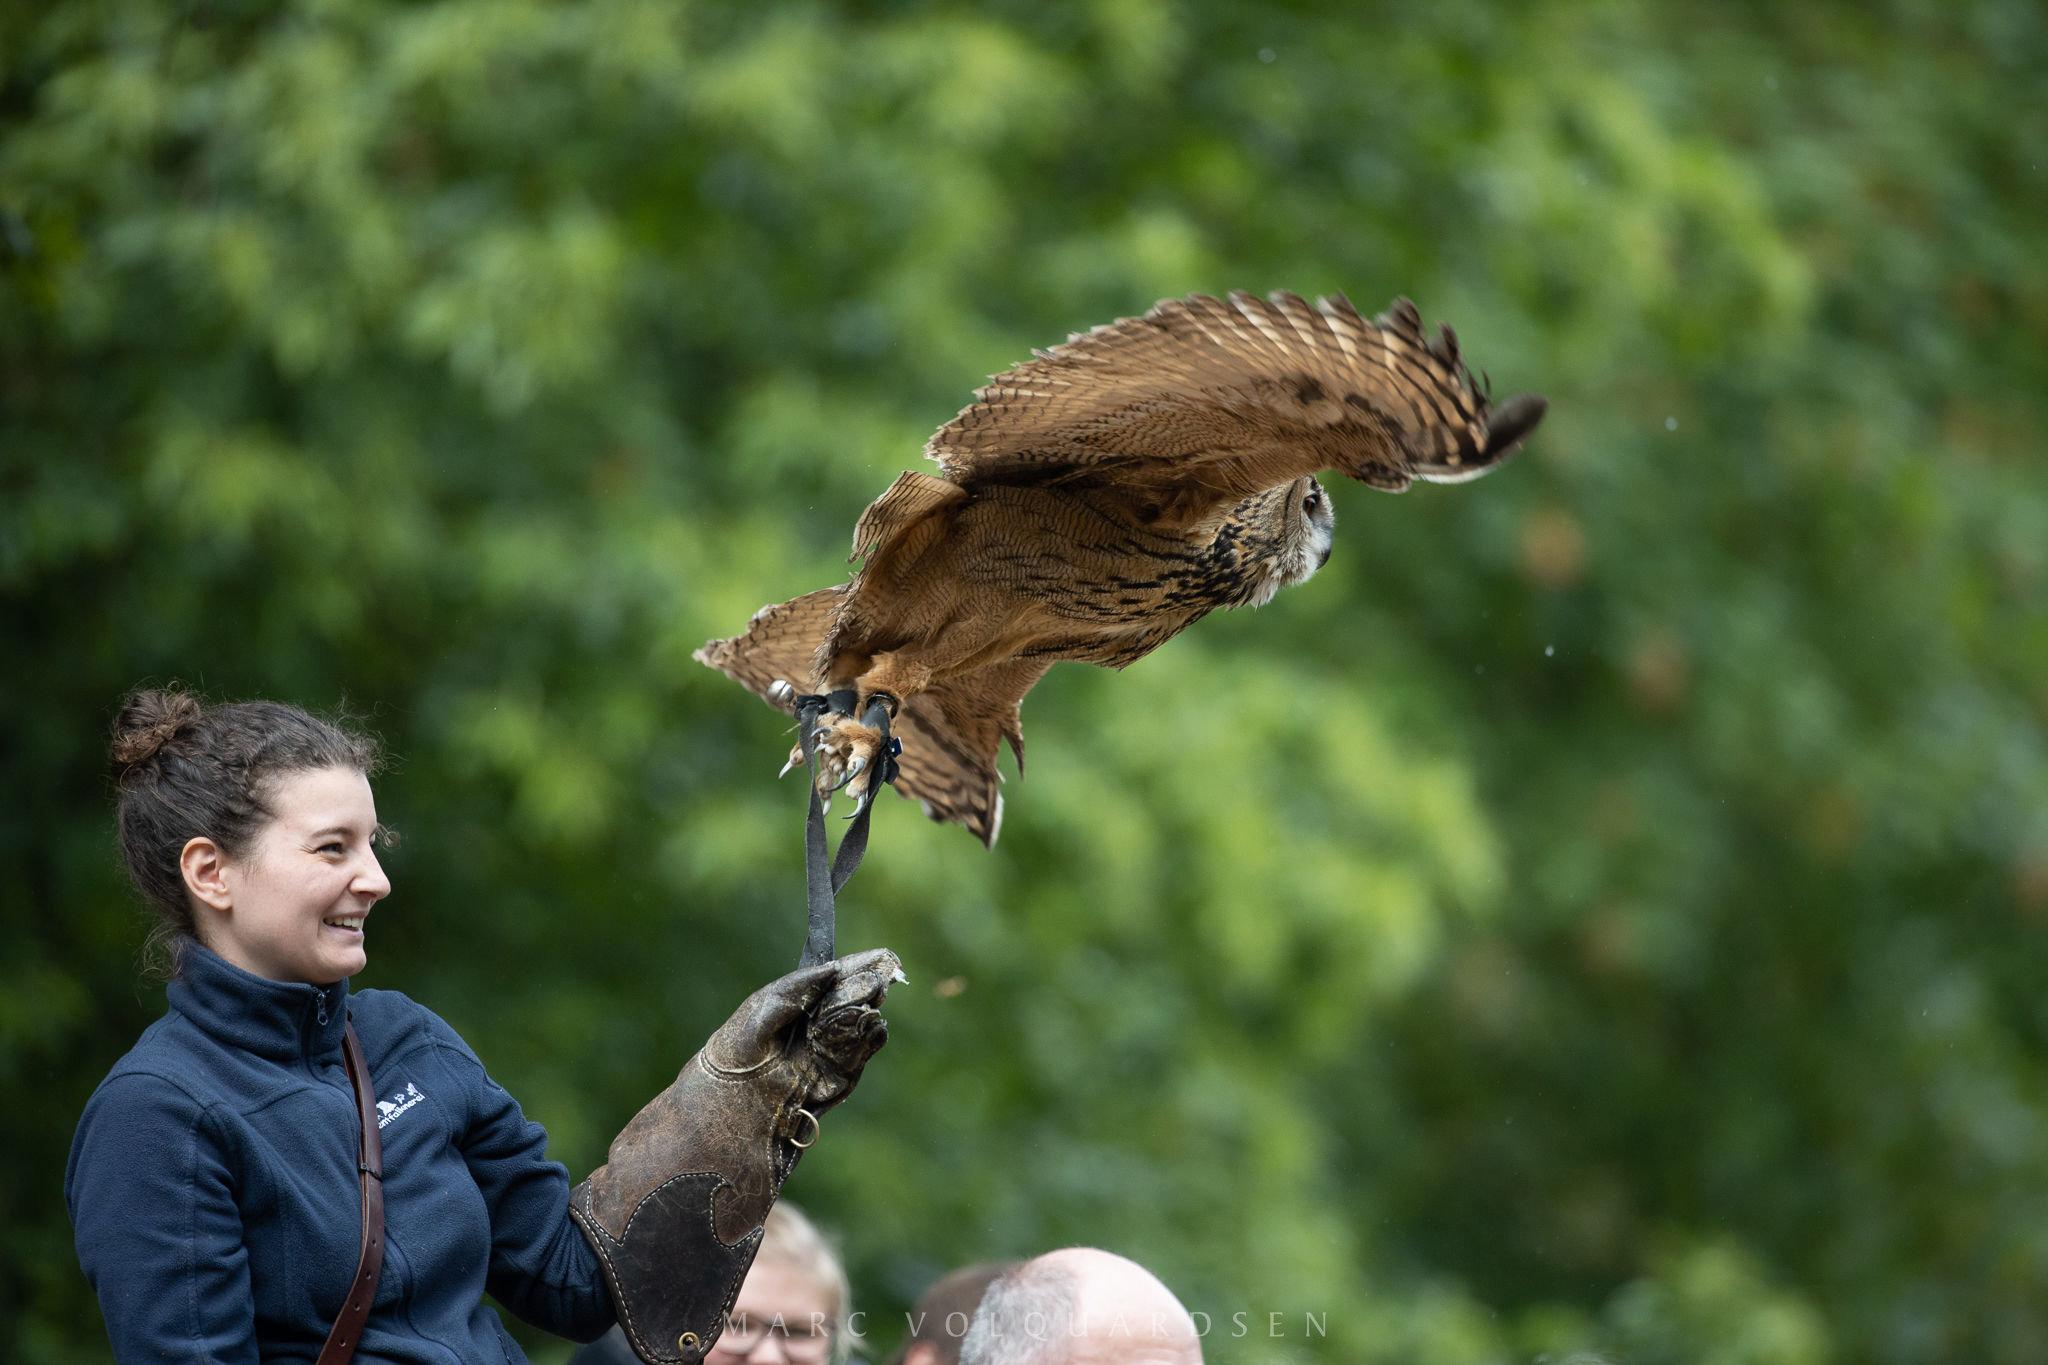 Wildlife Park Schwarze Berge - Owl departing (0500)